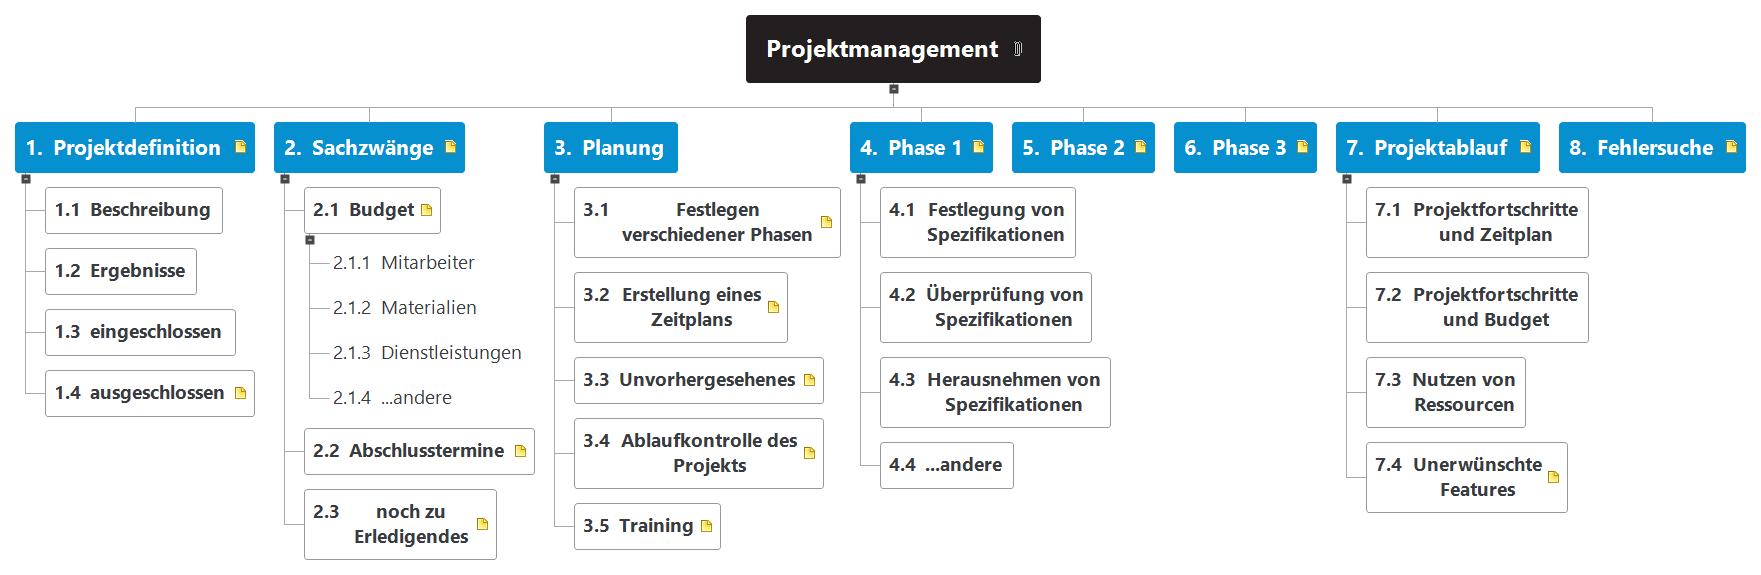 Projektmanagement WBS